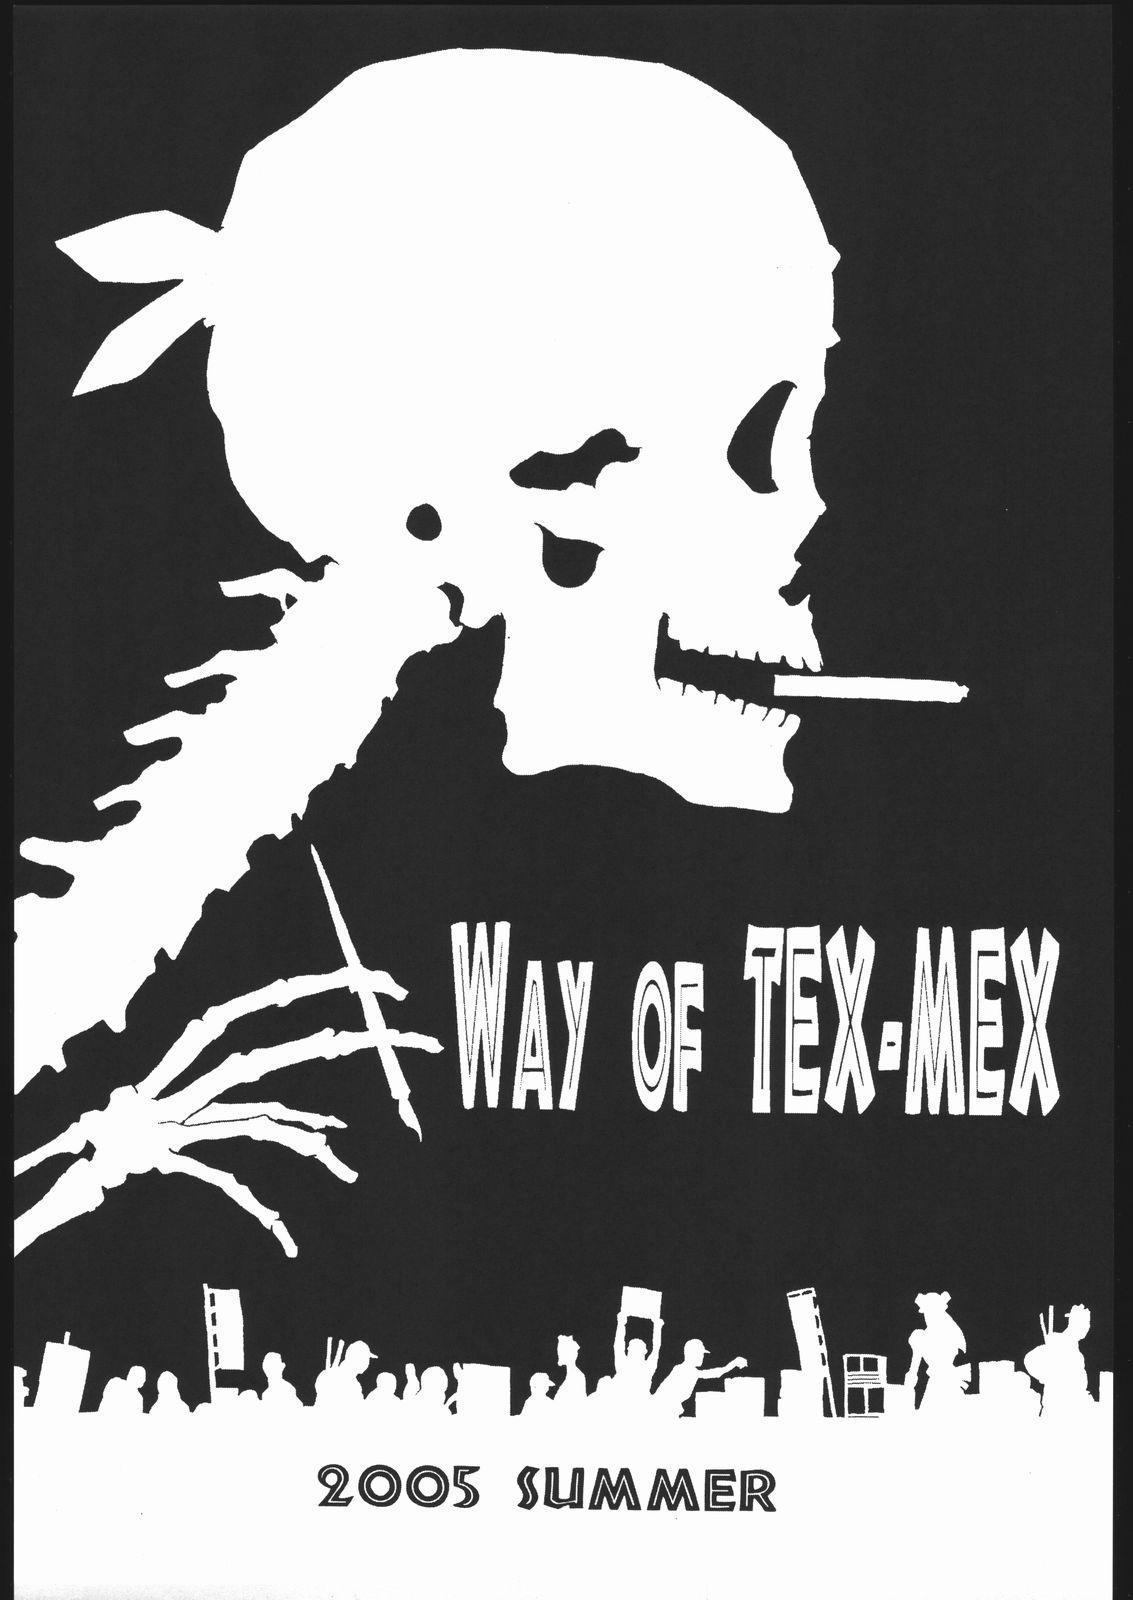 WAY OF TEX-MEX 1